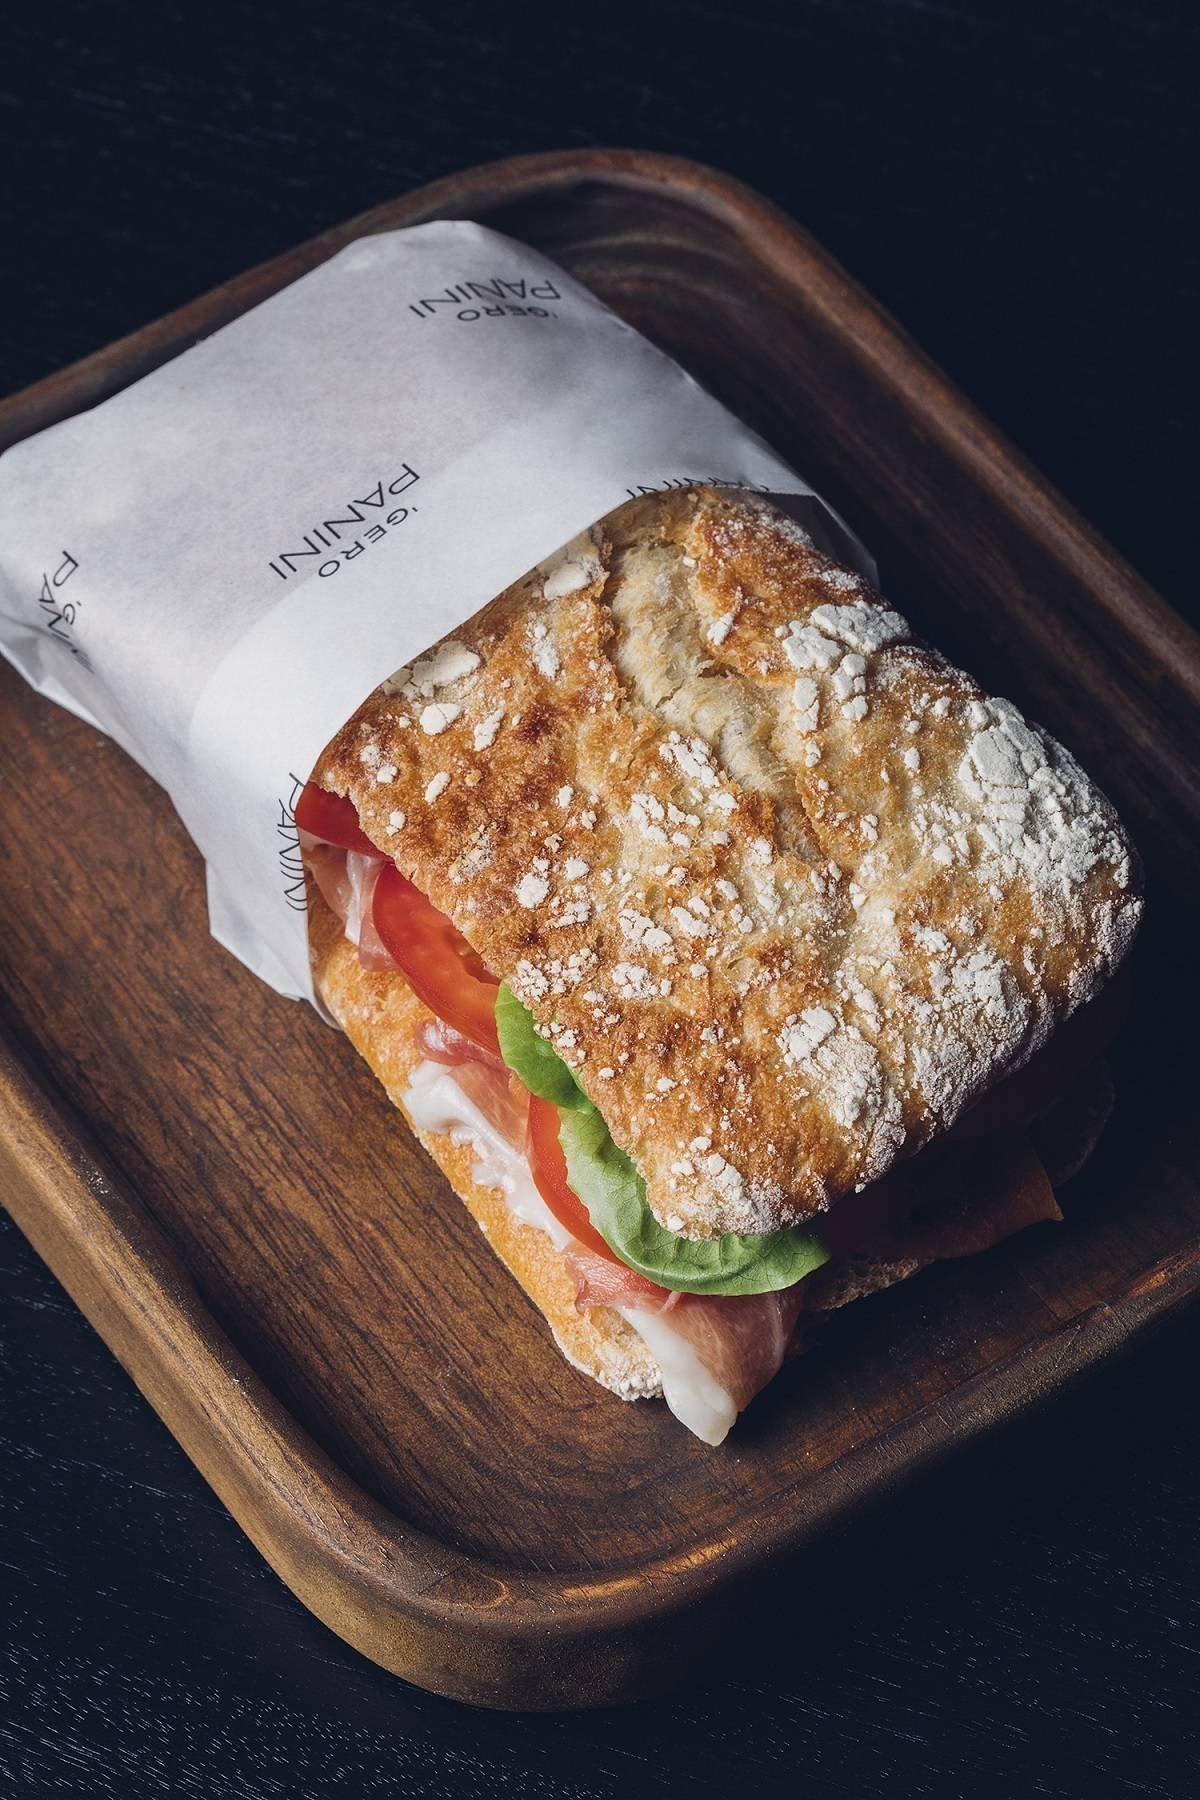 Gero Panini: panini de presunto cru com queijo brie, alface e tomate